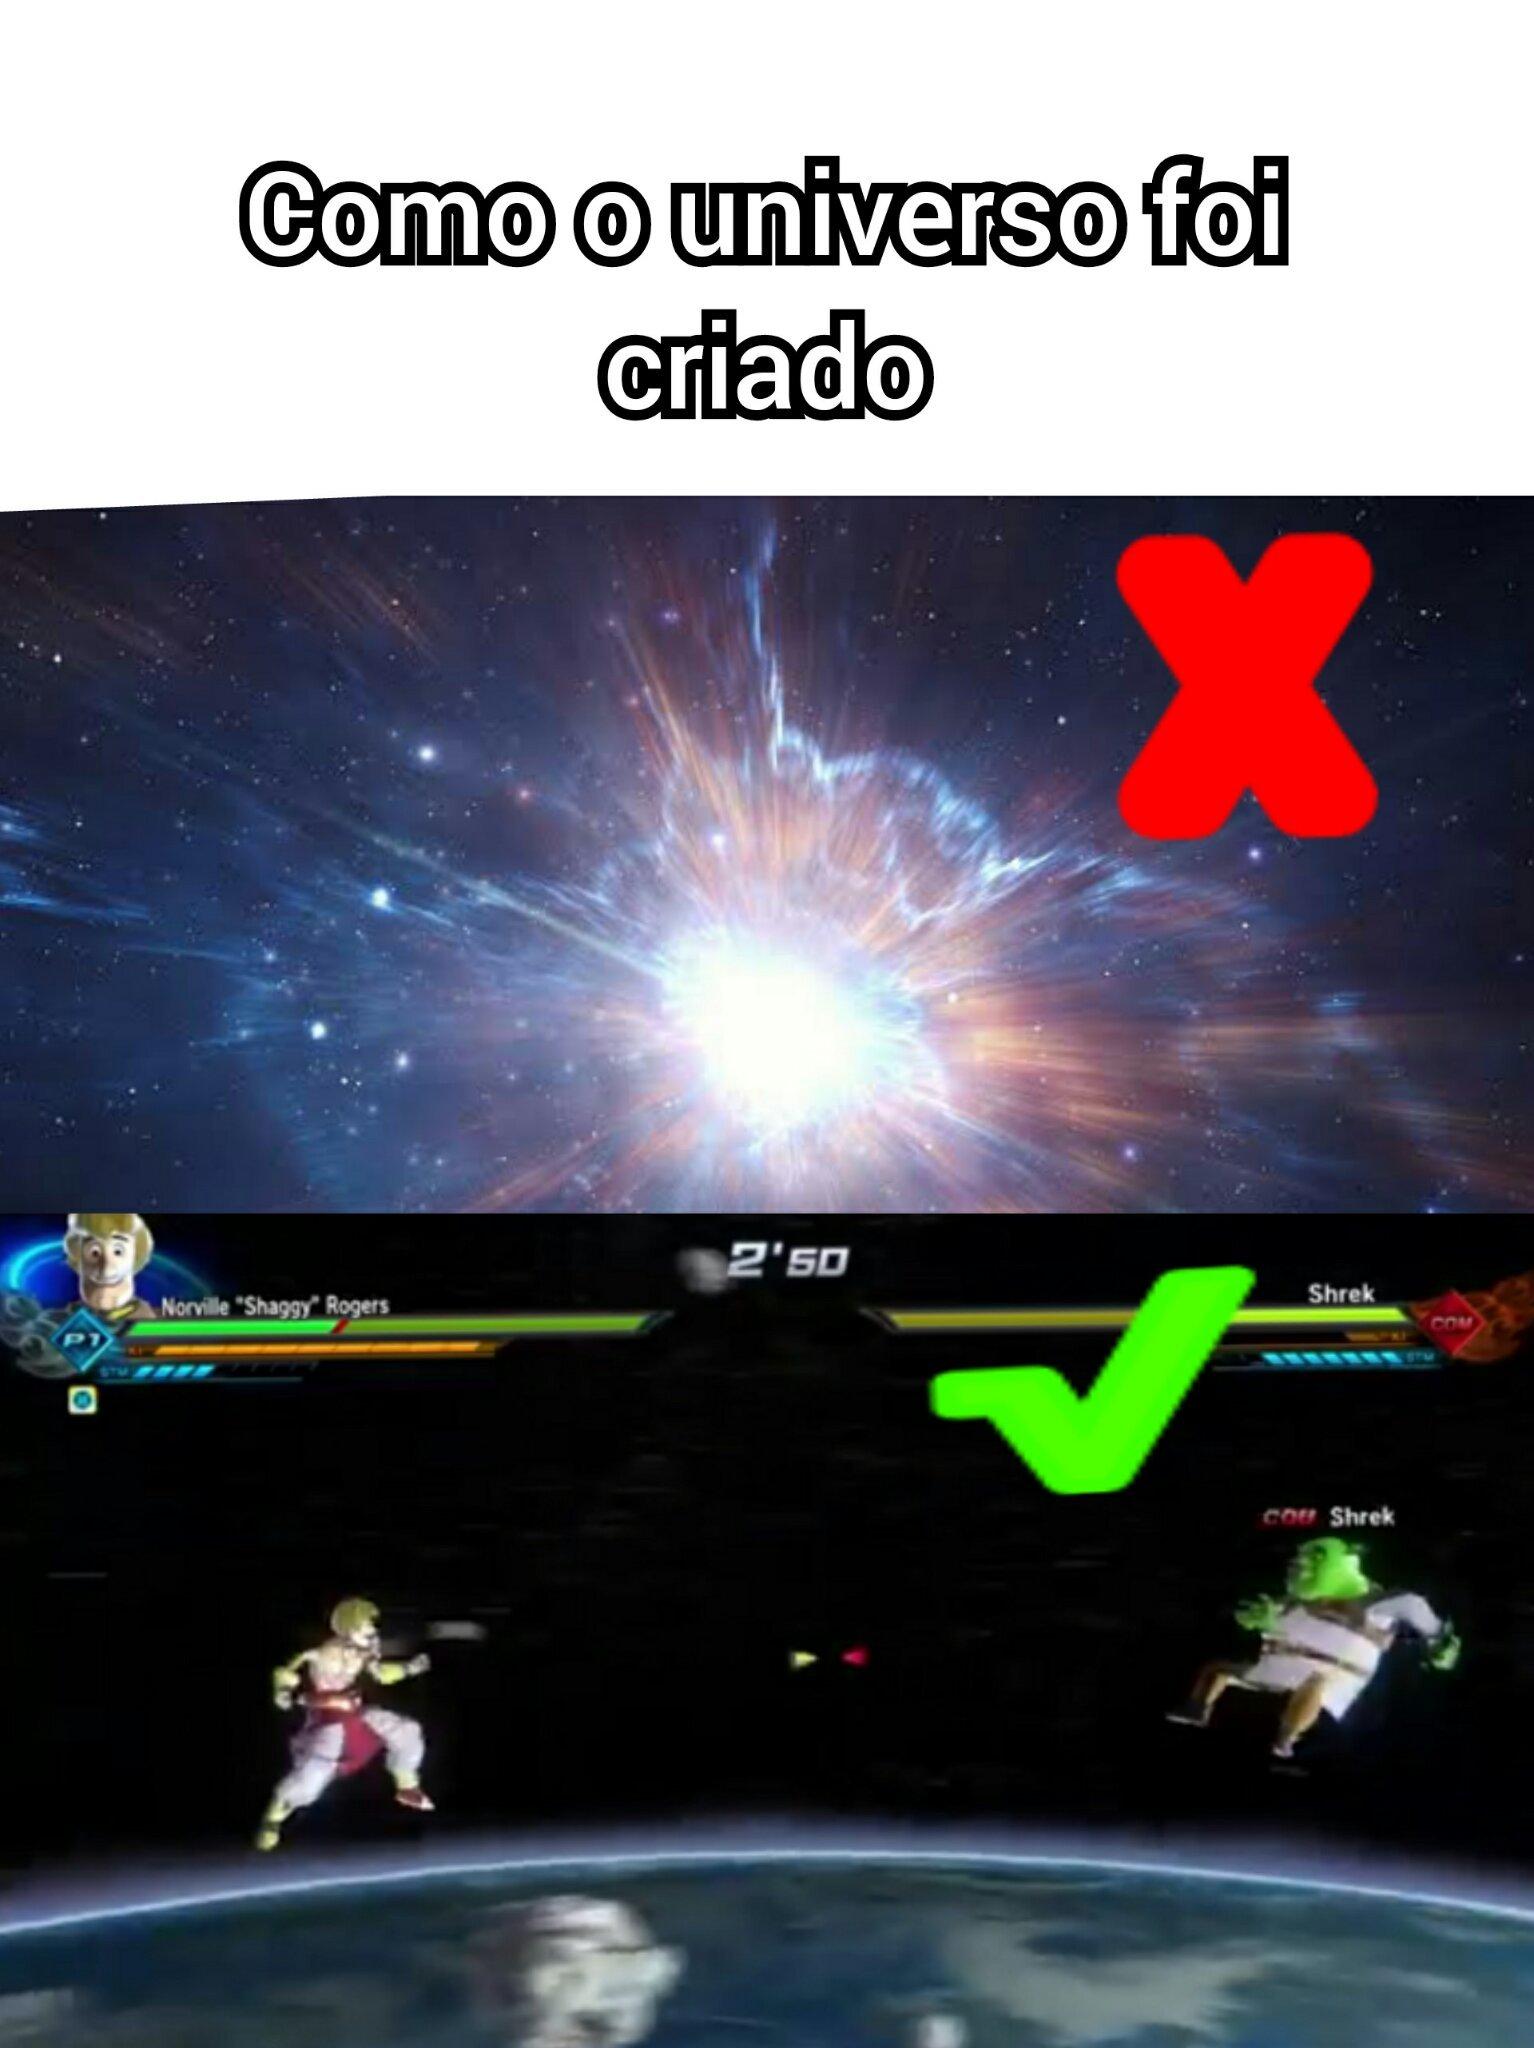 Saochicha vs shereco - meme